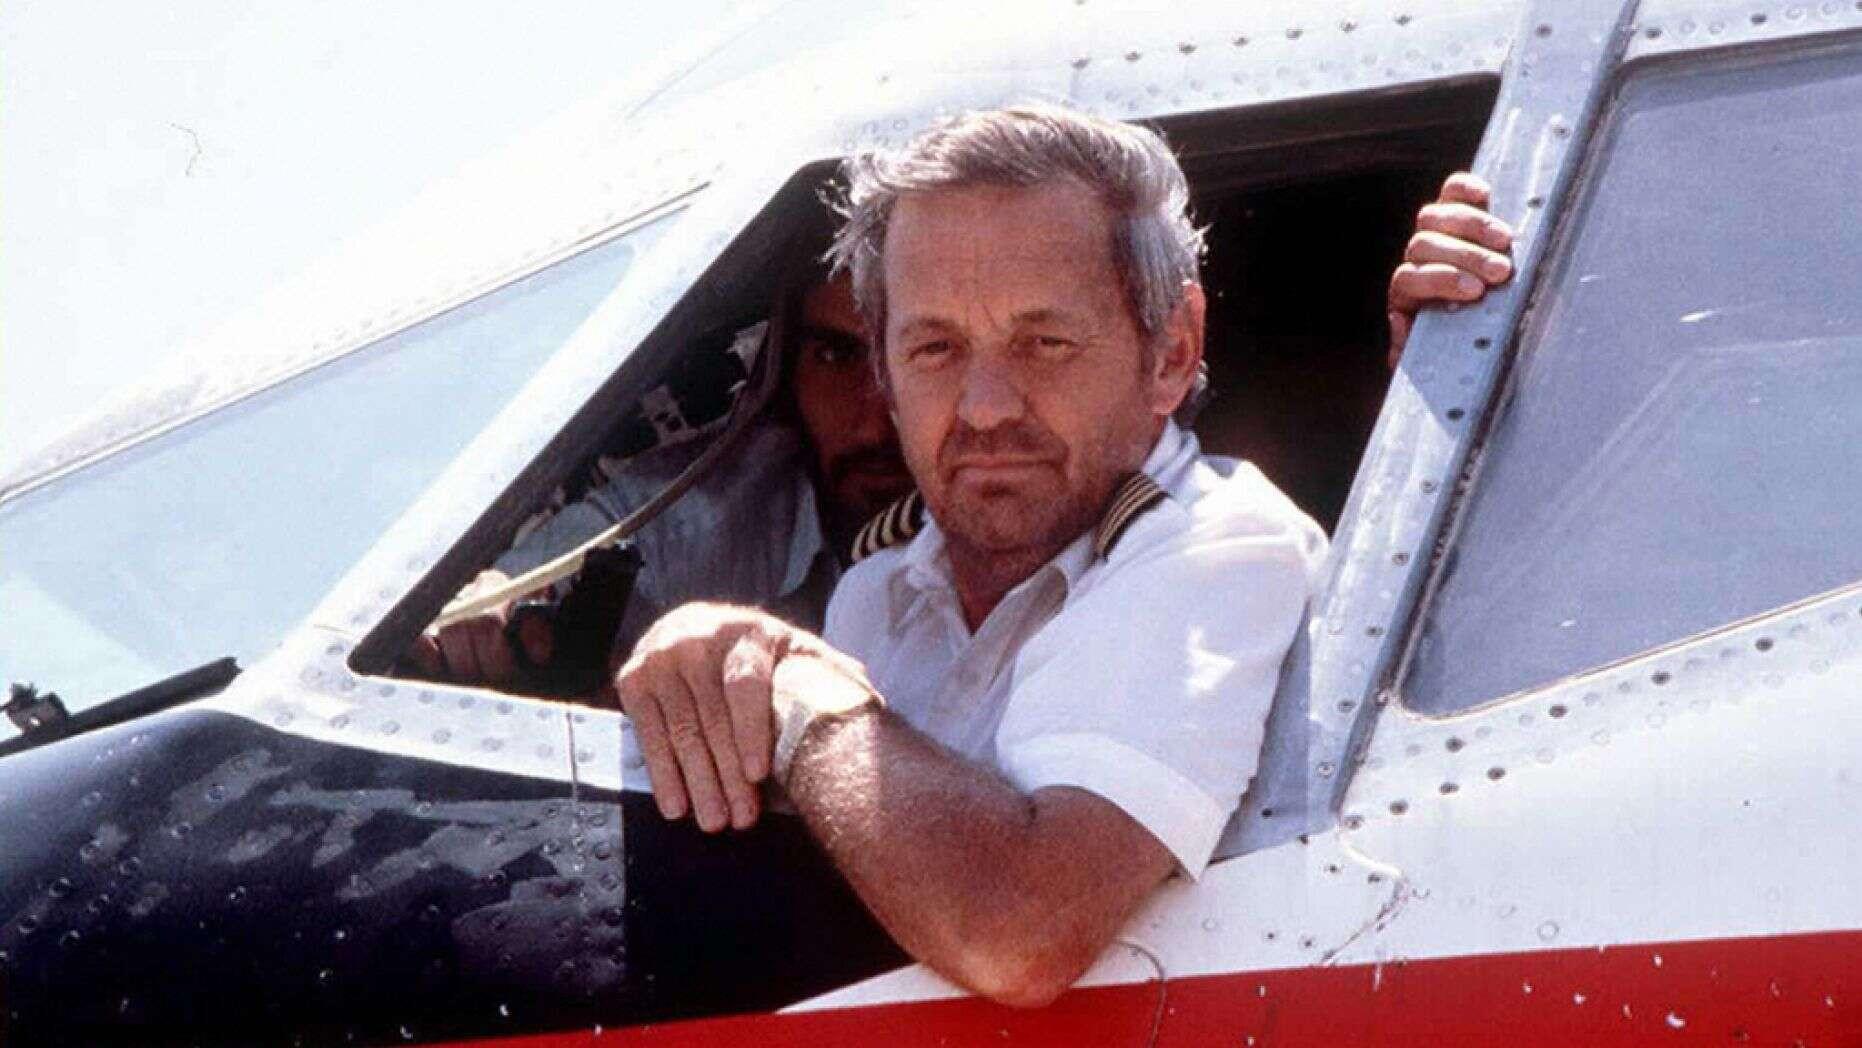 Suspect arrested in Greece over 1985 TWA airplane hijacking lindaikejisblog